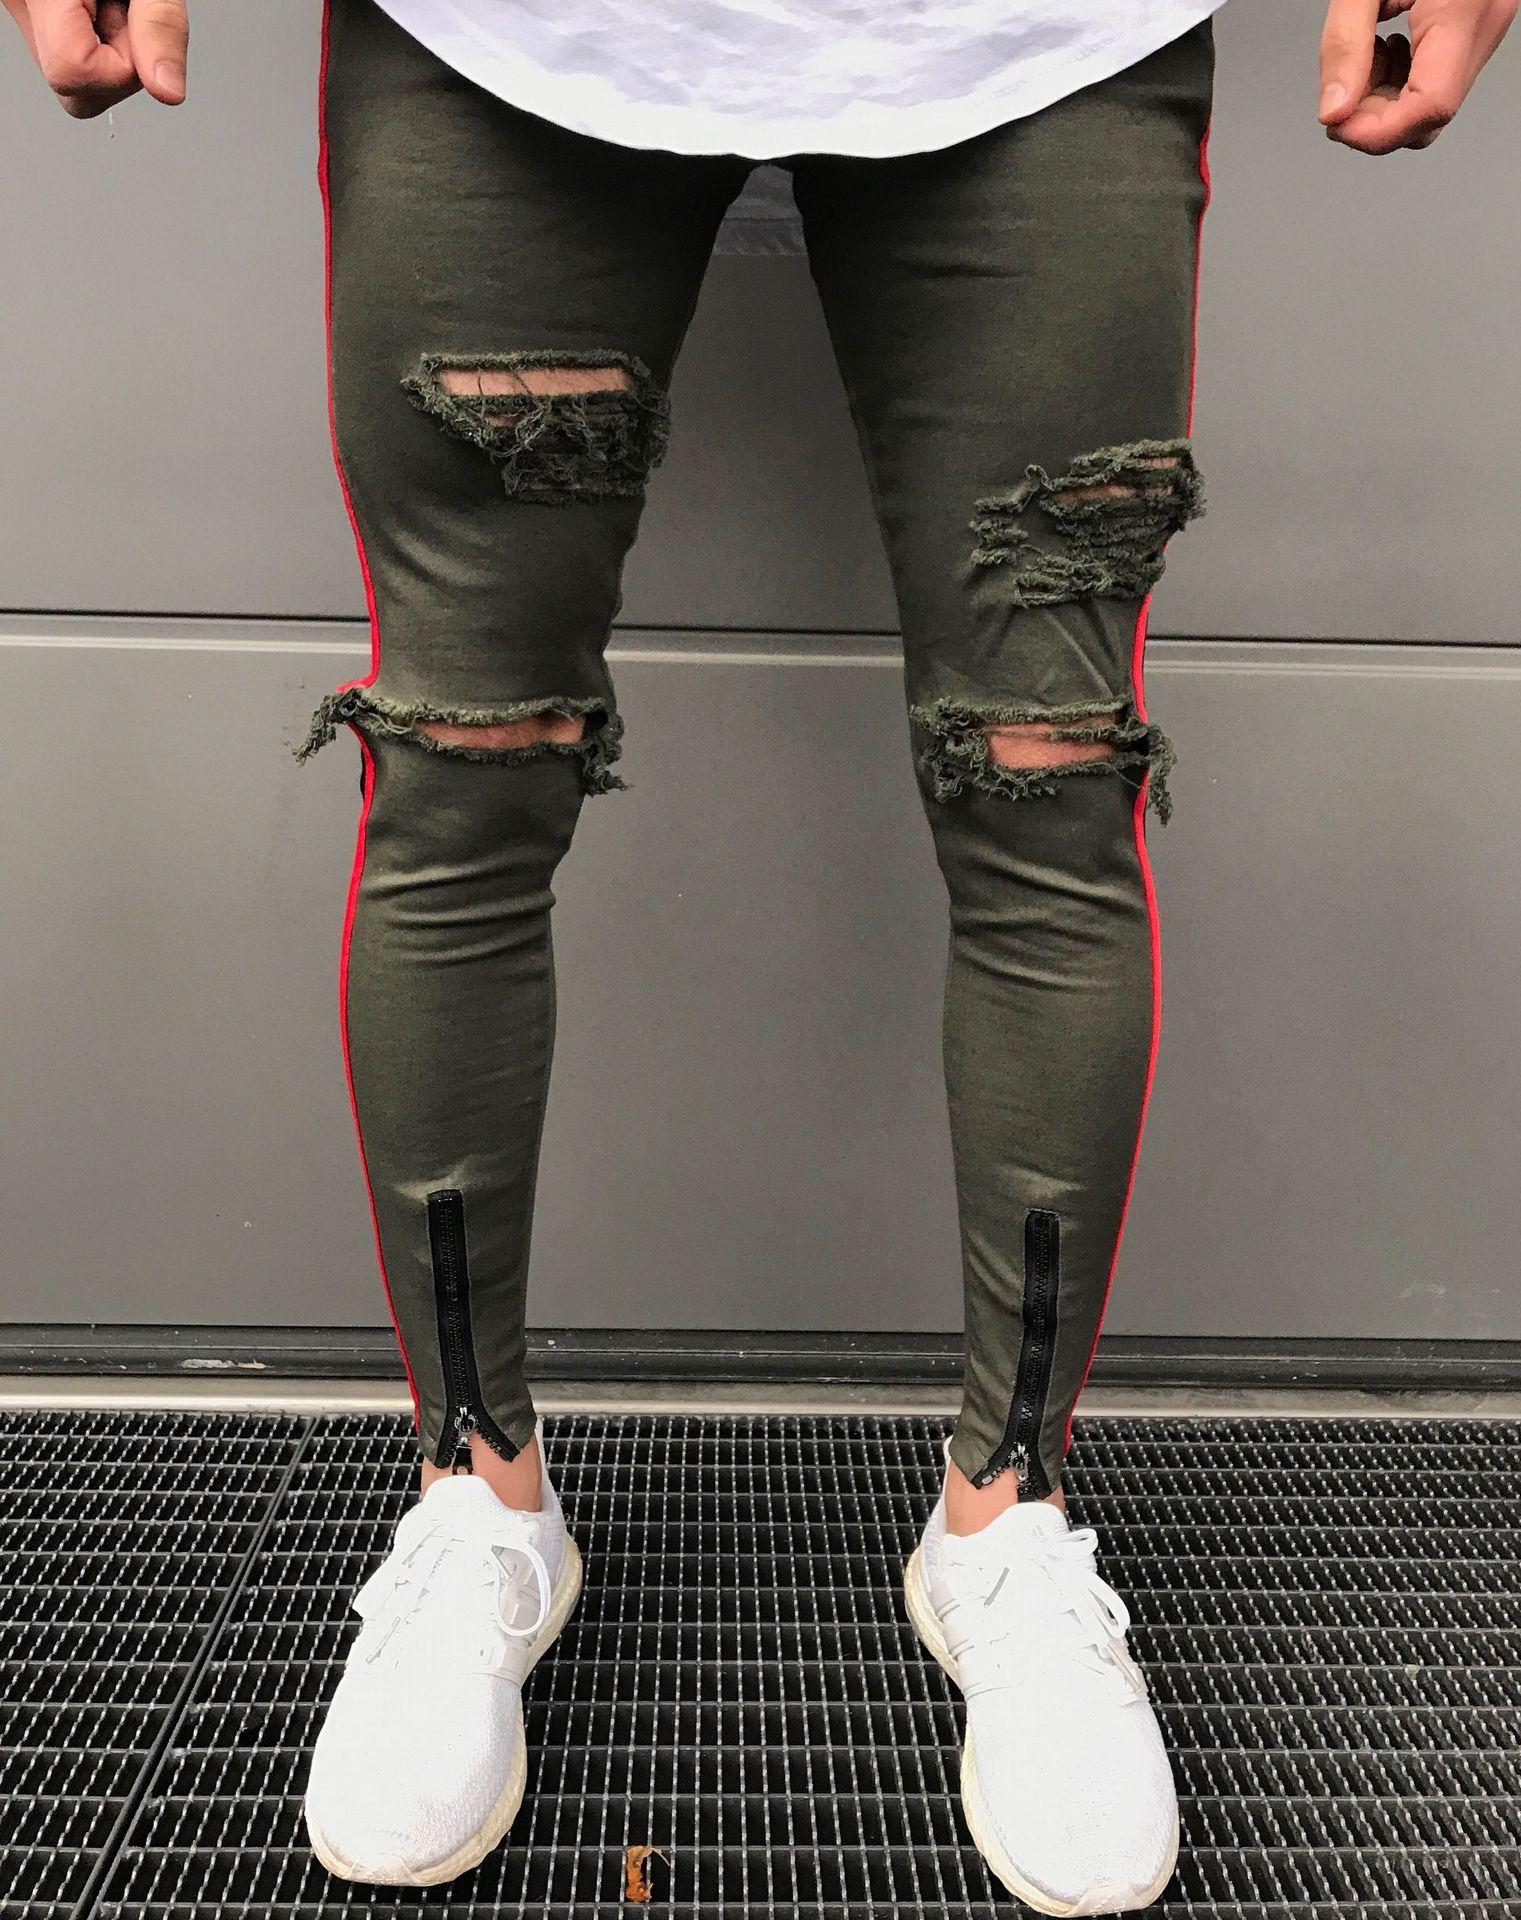 32b20aa42c81 New Mens Skinny Jeans Black Army Zipper Slim Biker Jeans Hip Hop Knee Hole  Ripped Denim High -Street Swag Plus Size Pants For Men